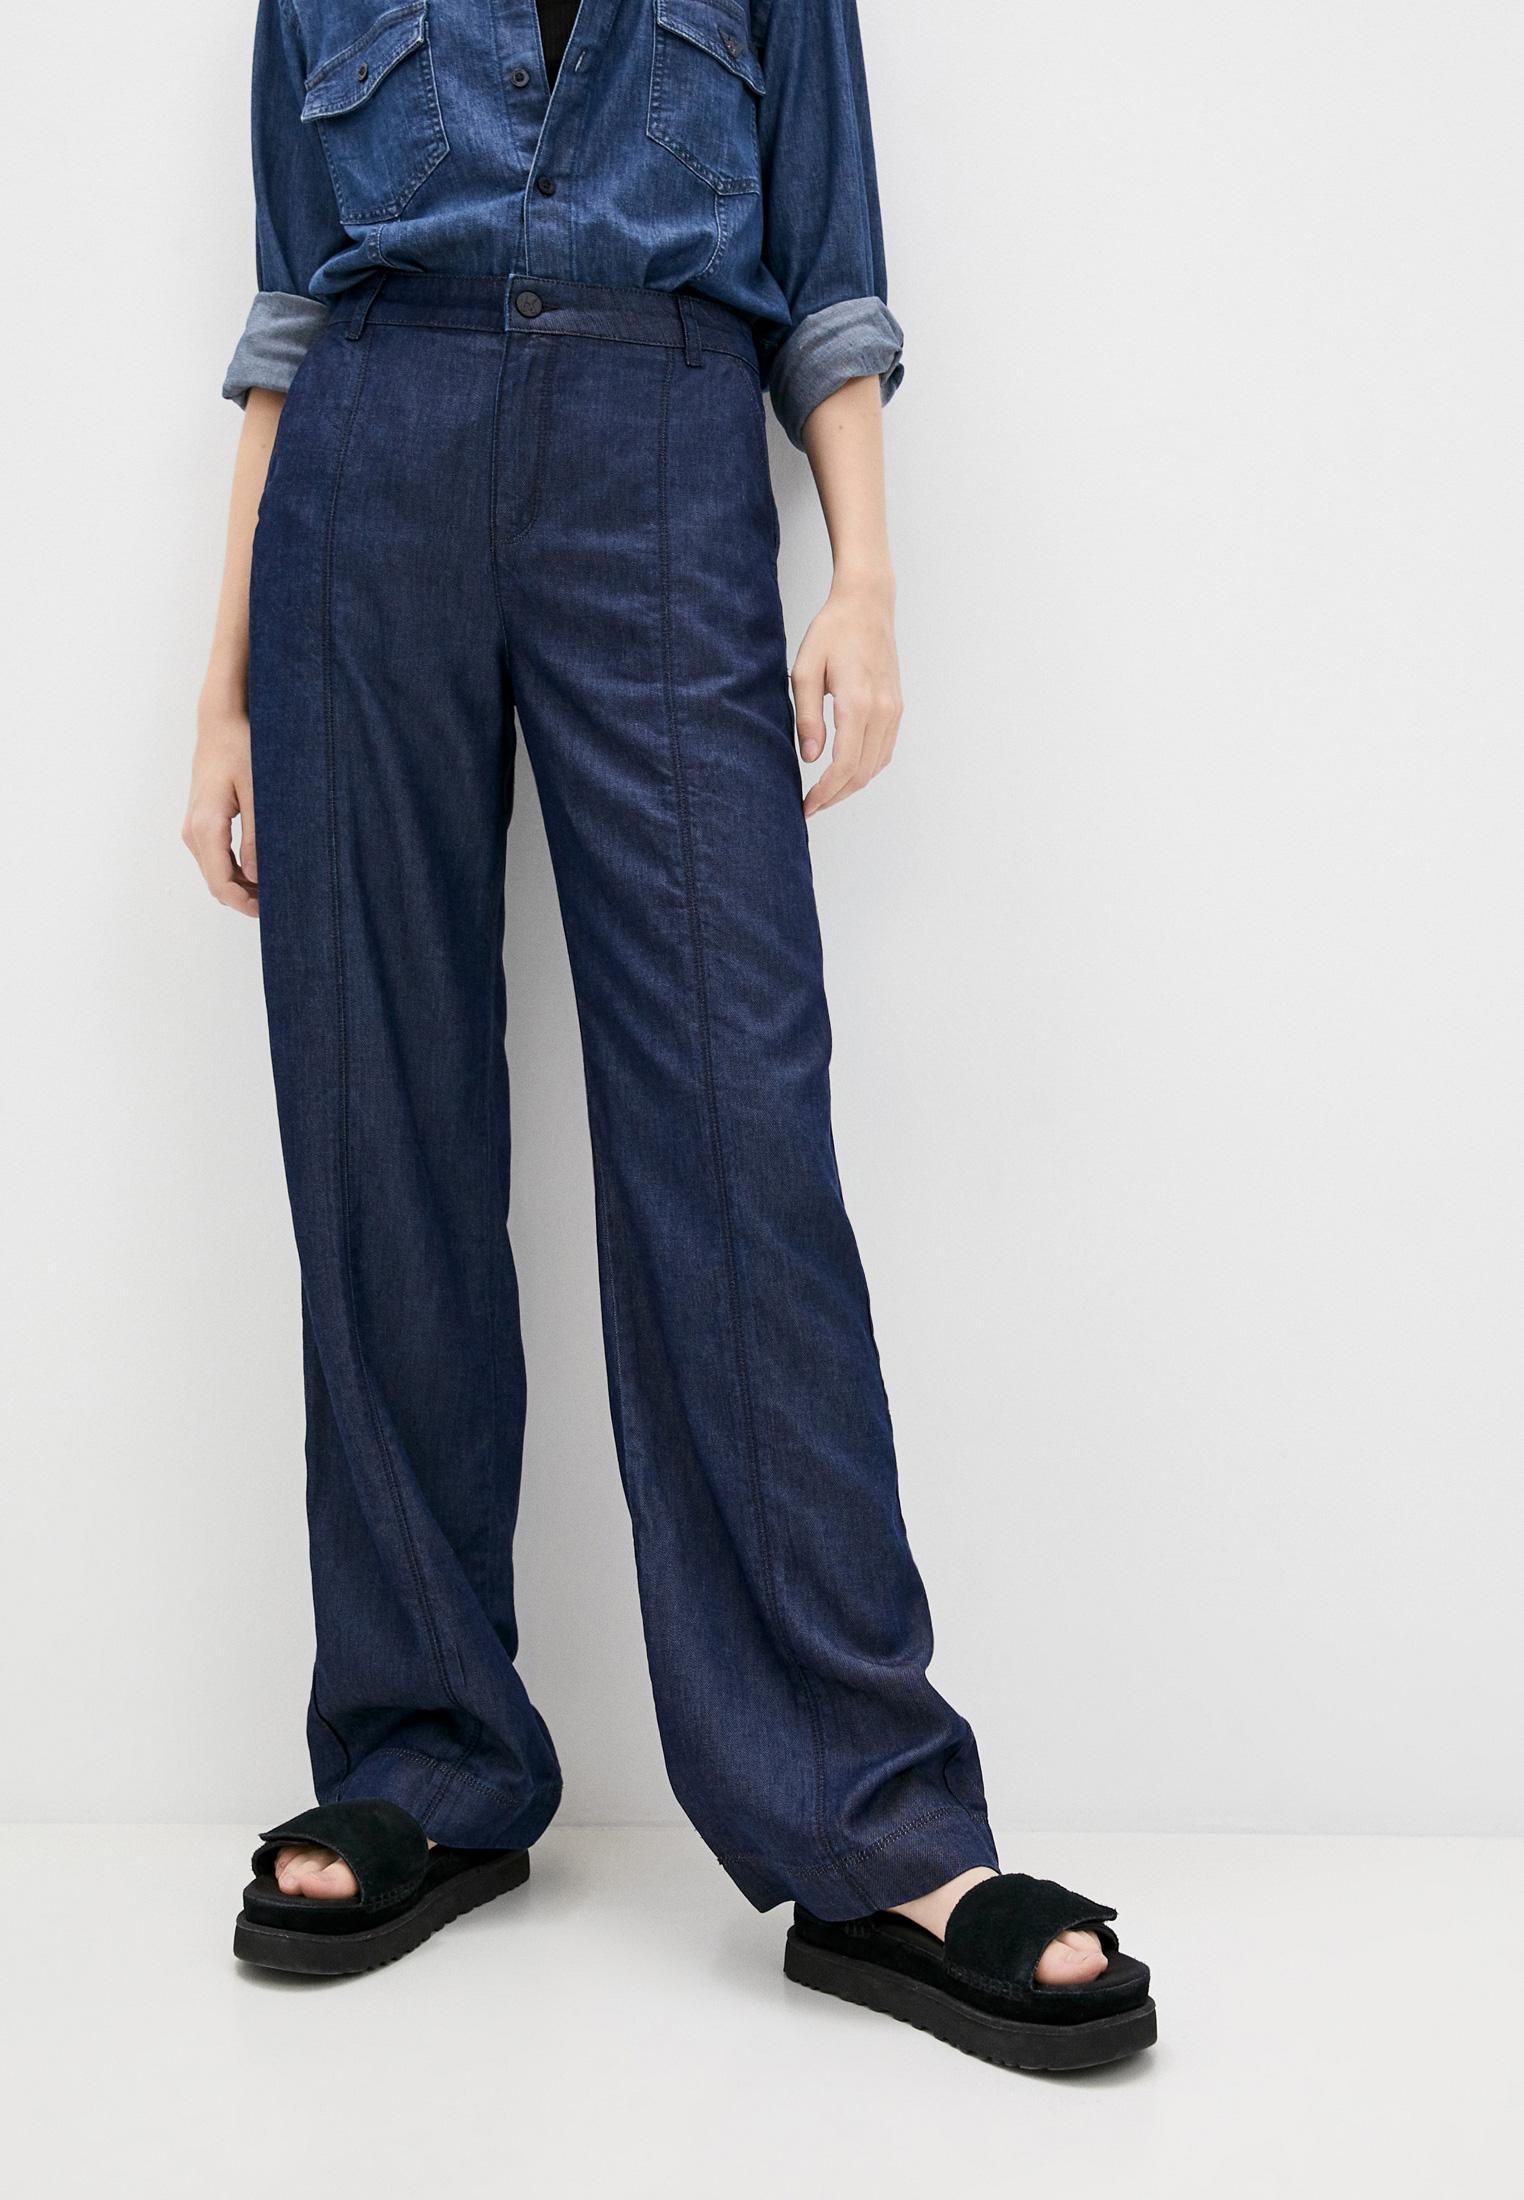 Широкие и расклешенные джинсы Karl Lagerfeld Джинсы Karl Lagerfeld